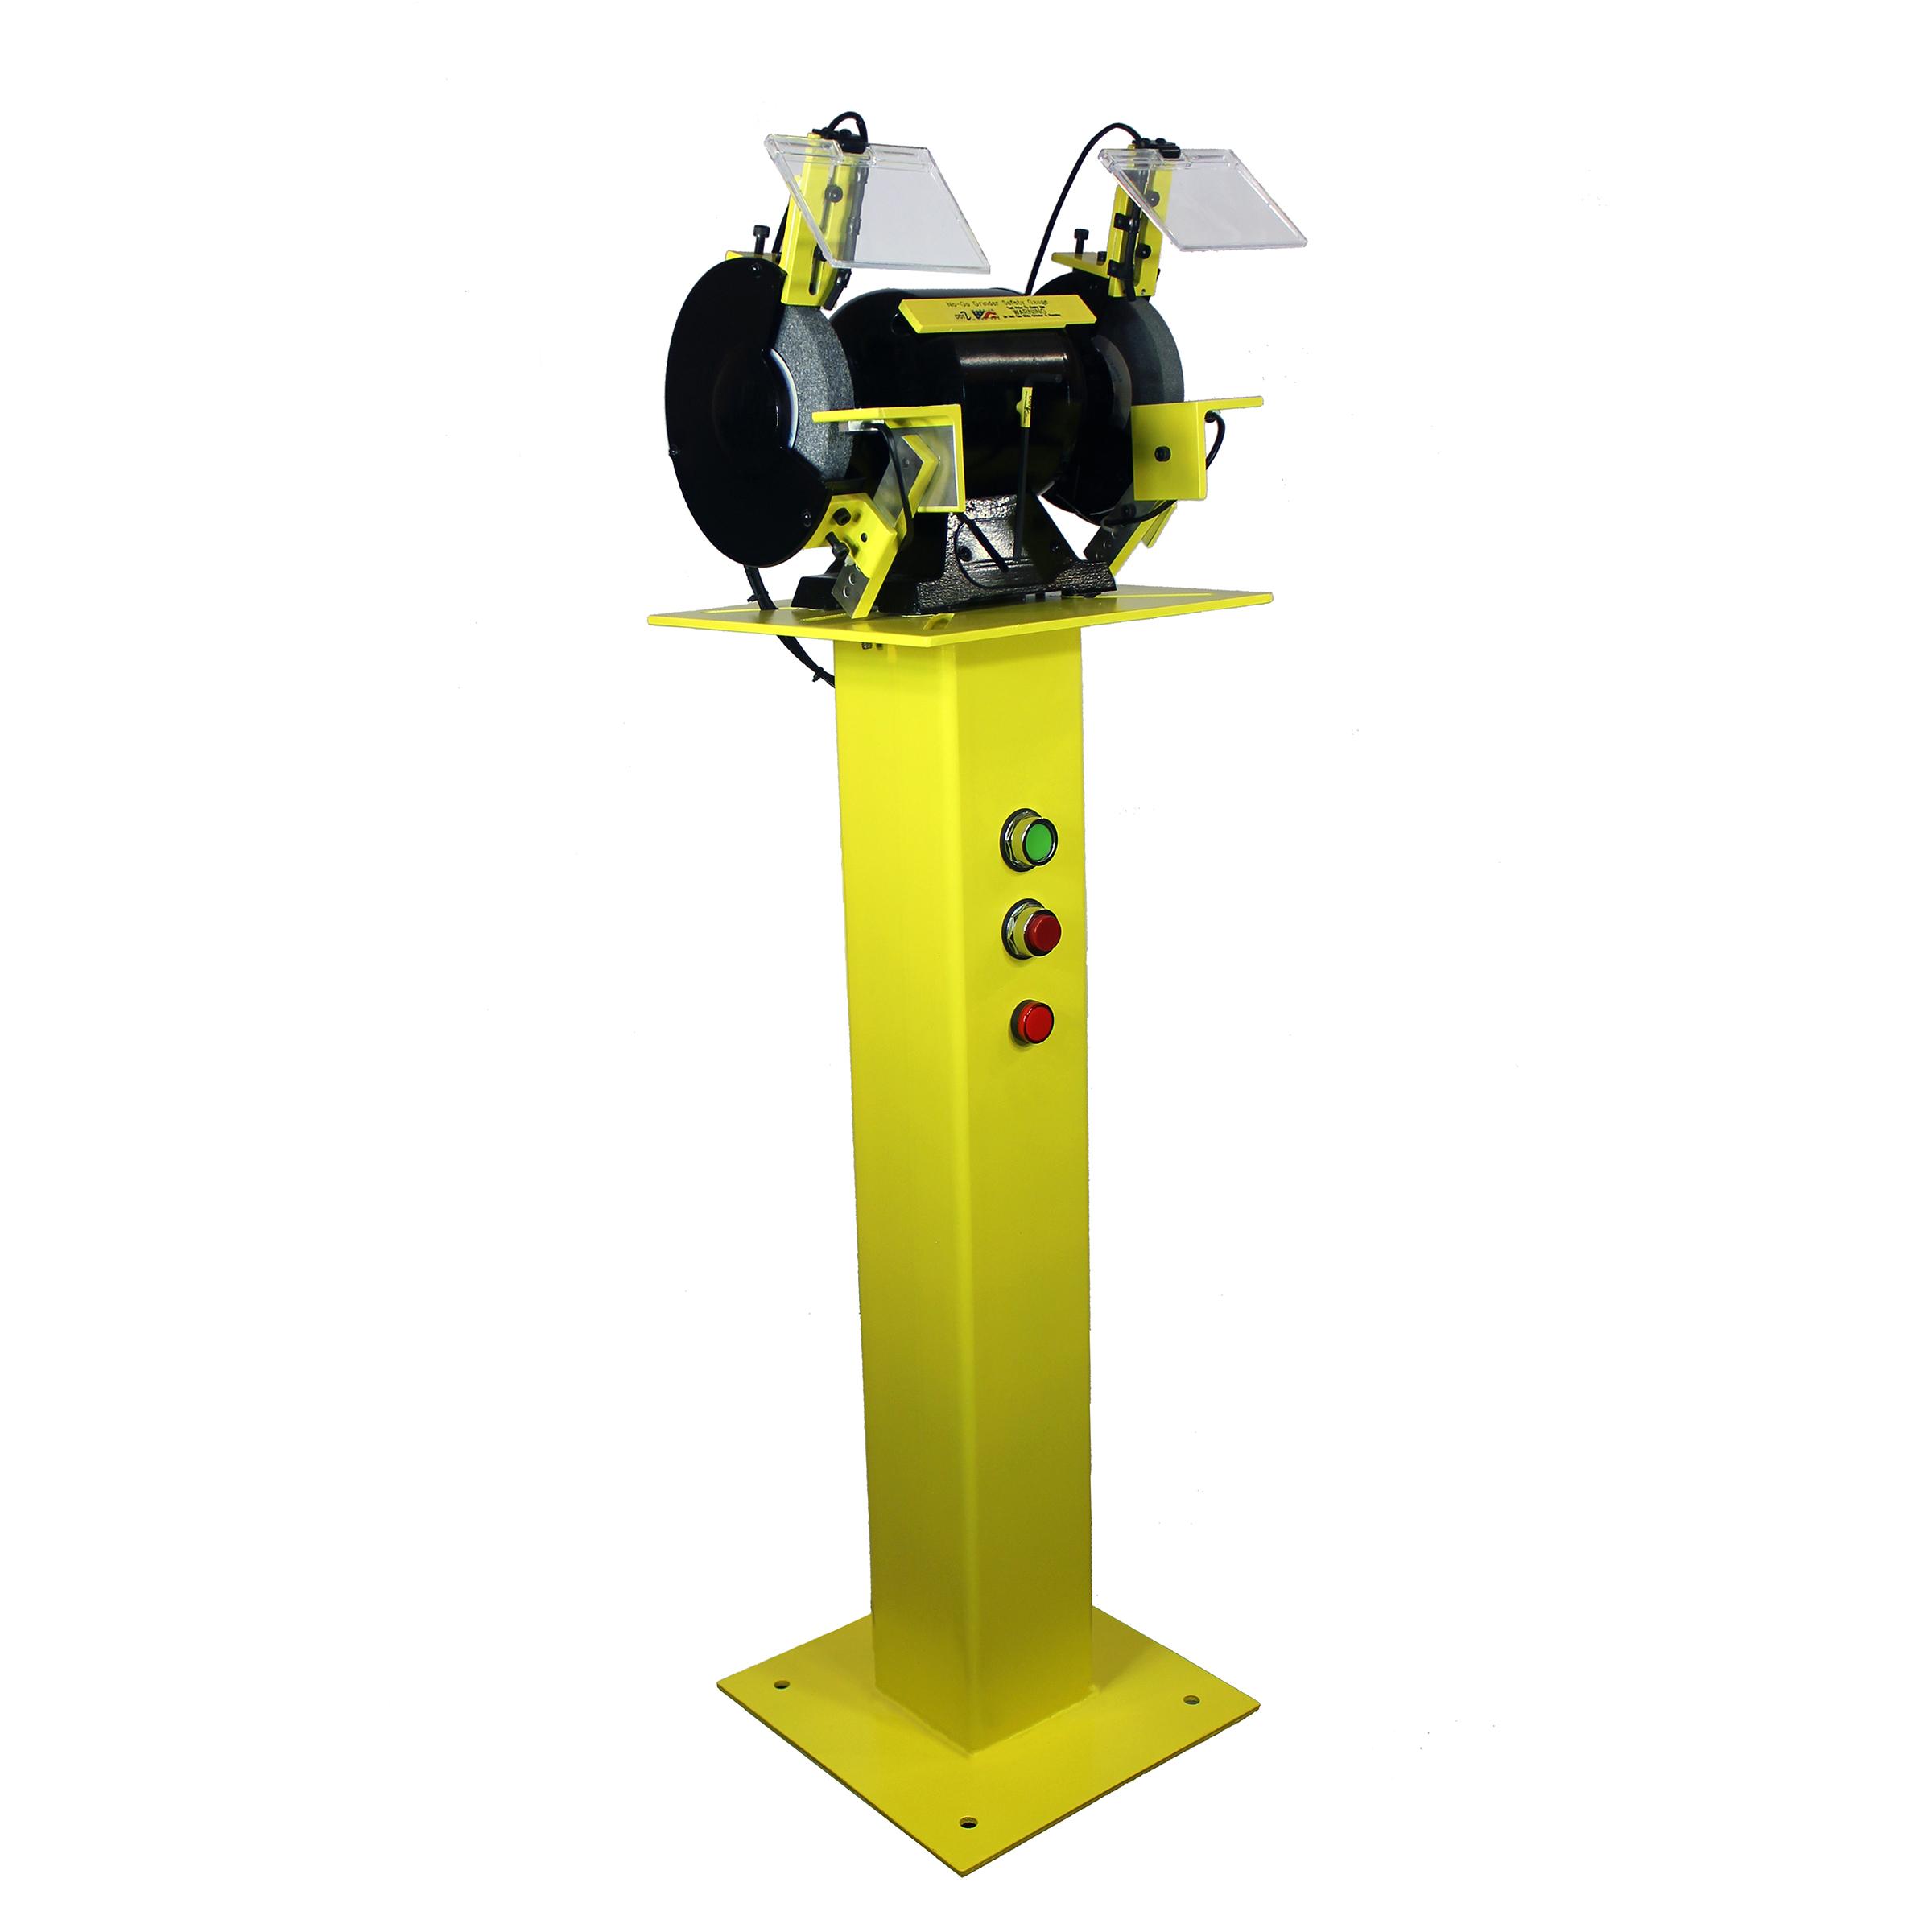 Attractive Bench Grinder Safety Scale Part - 9: No-Go™ Grinder Safety Stand